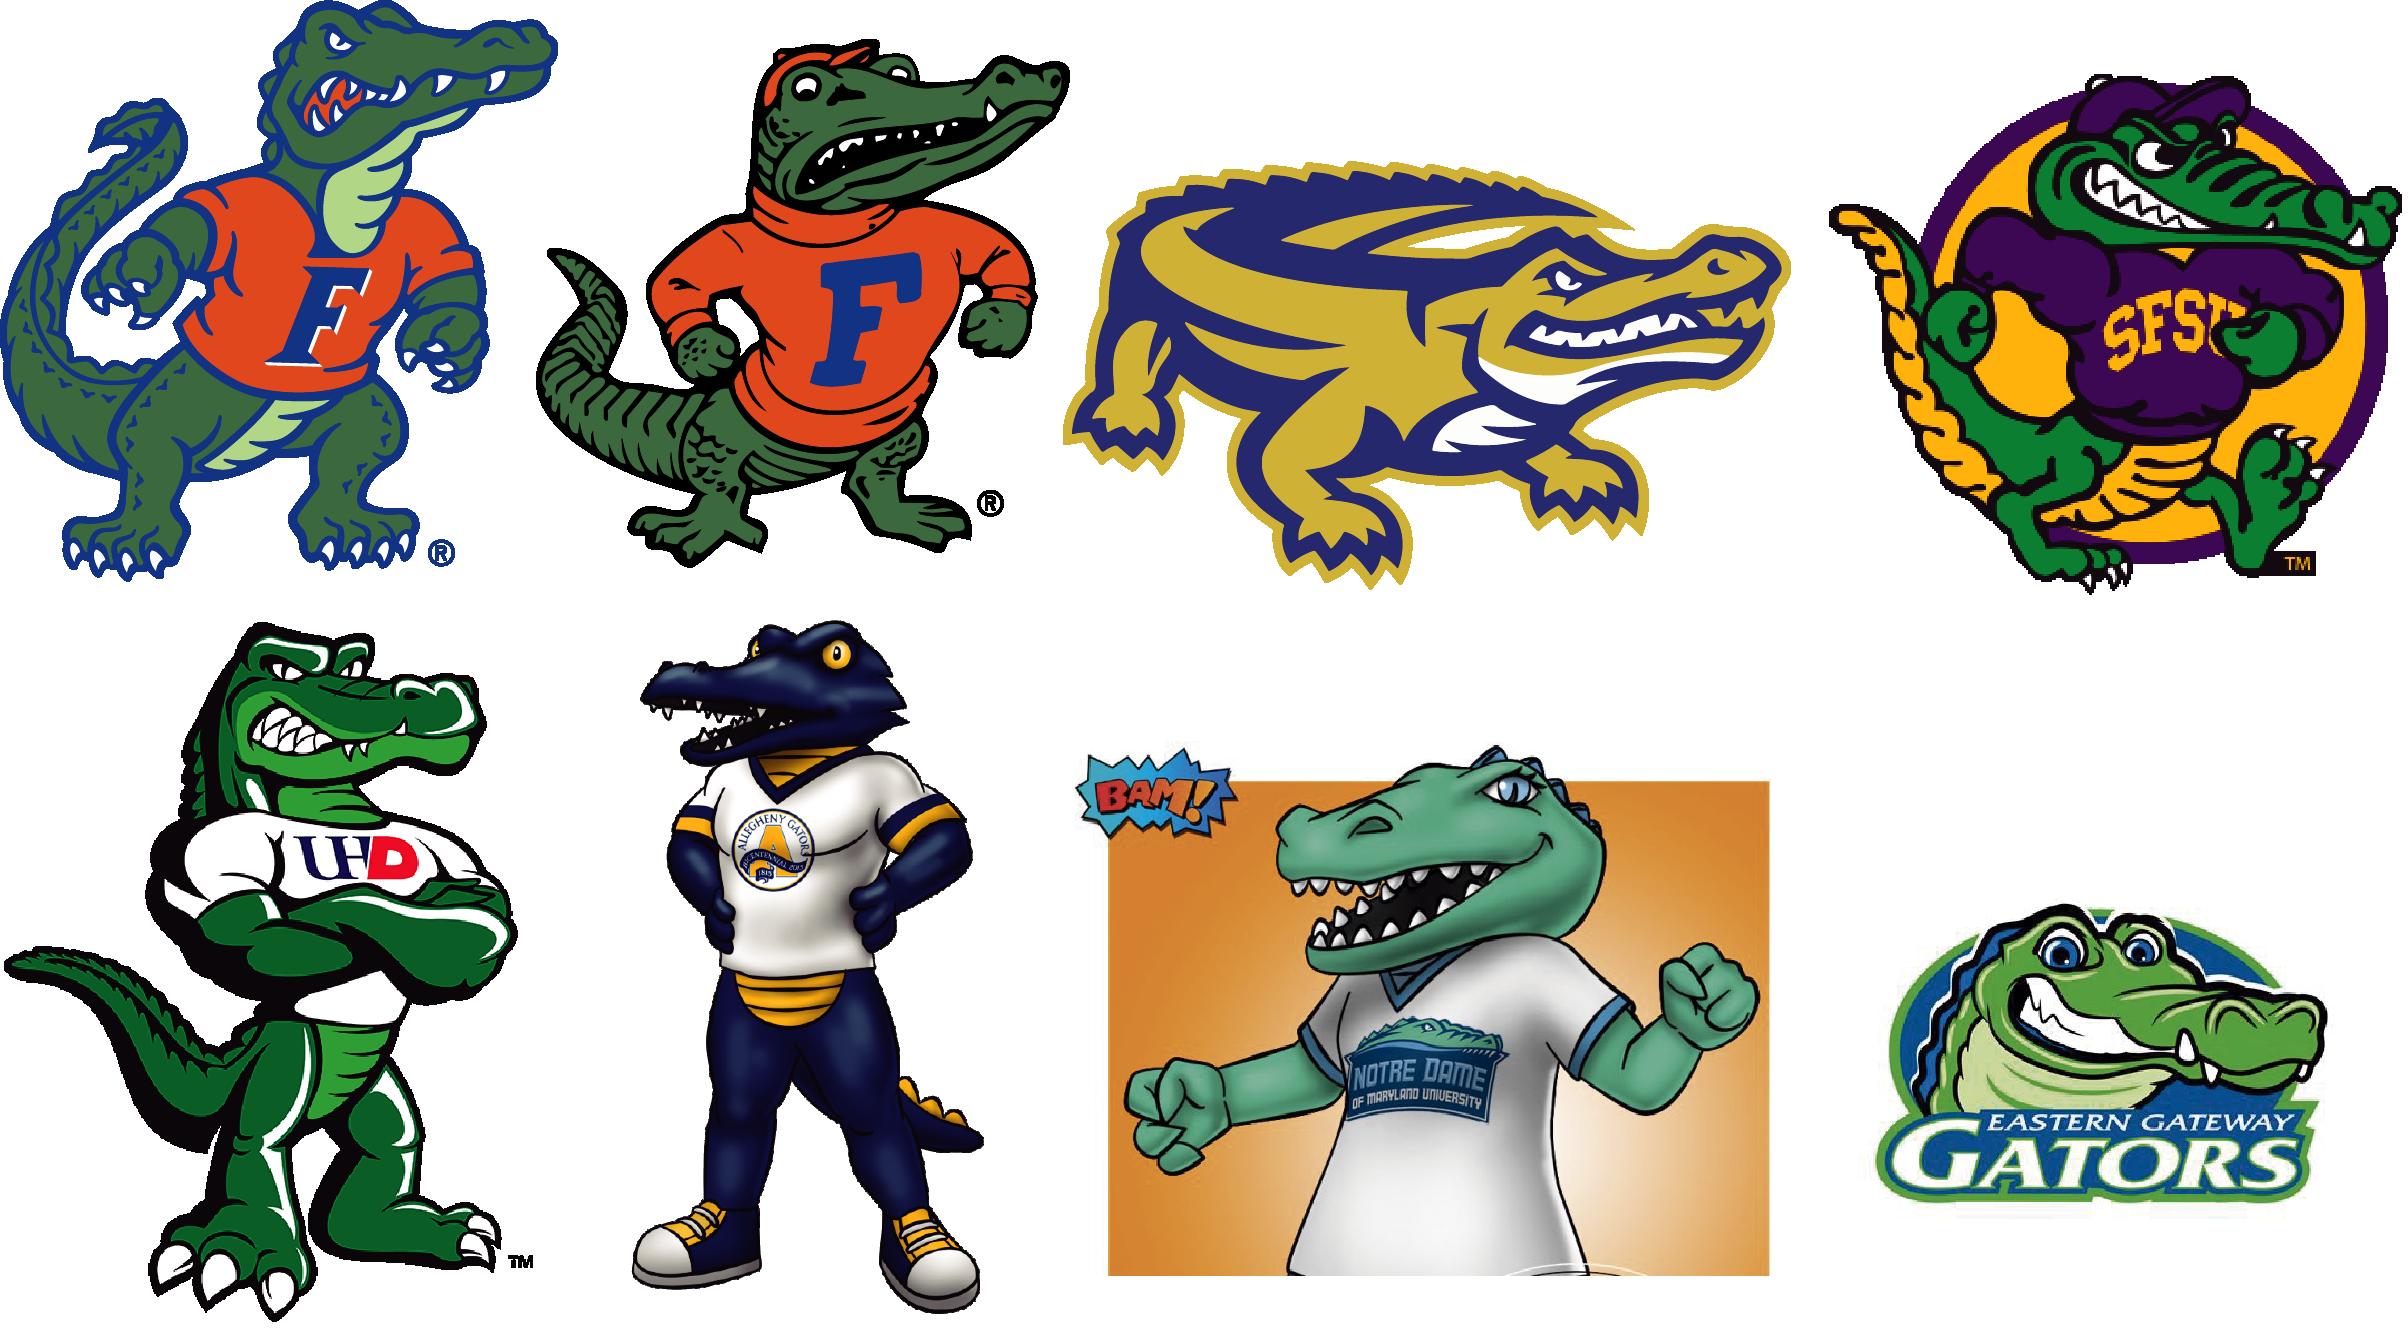 Florida gators baseball clipart. Football miami hurricanes